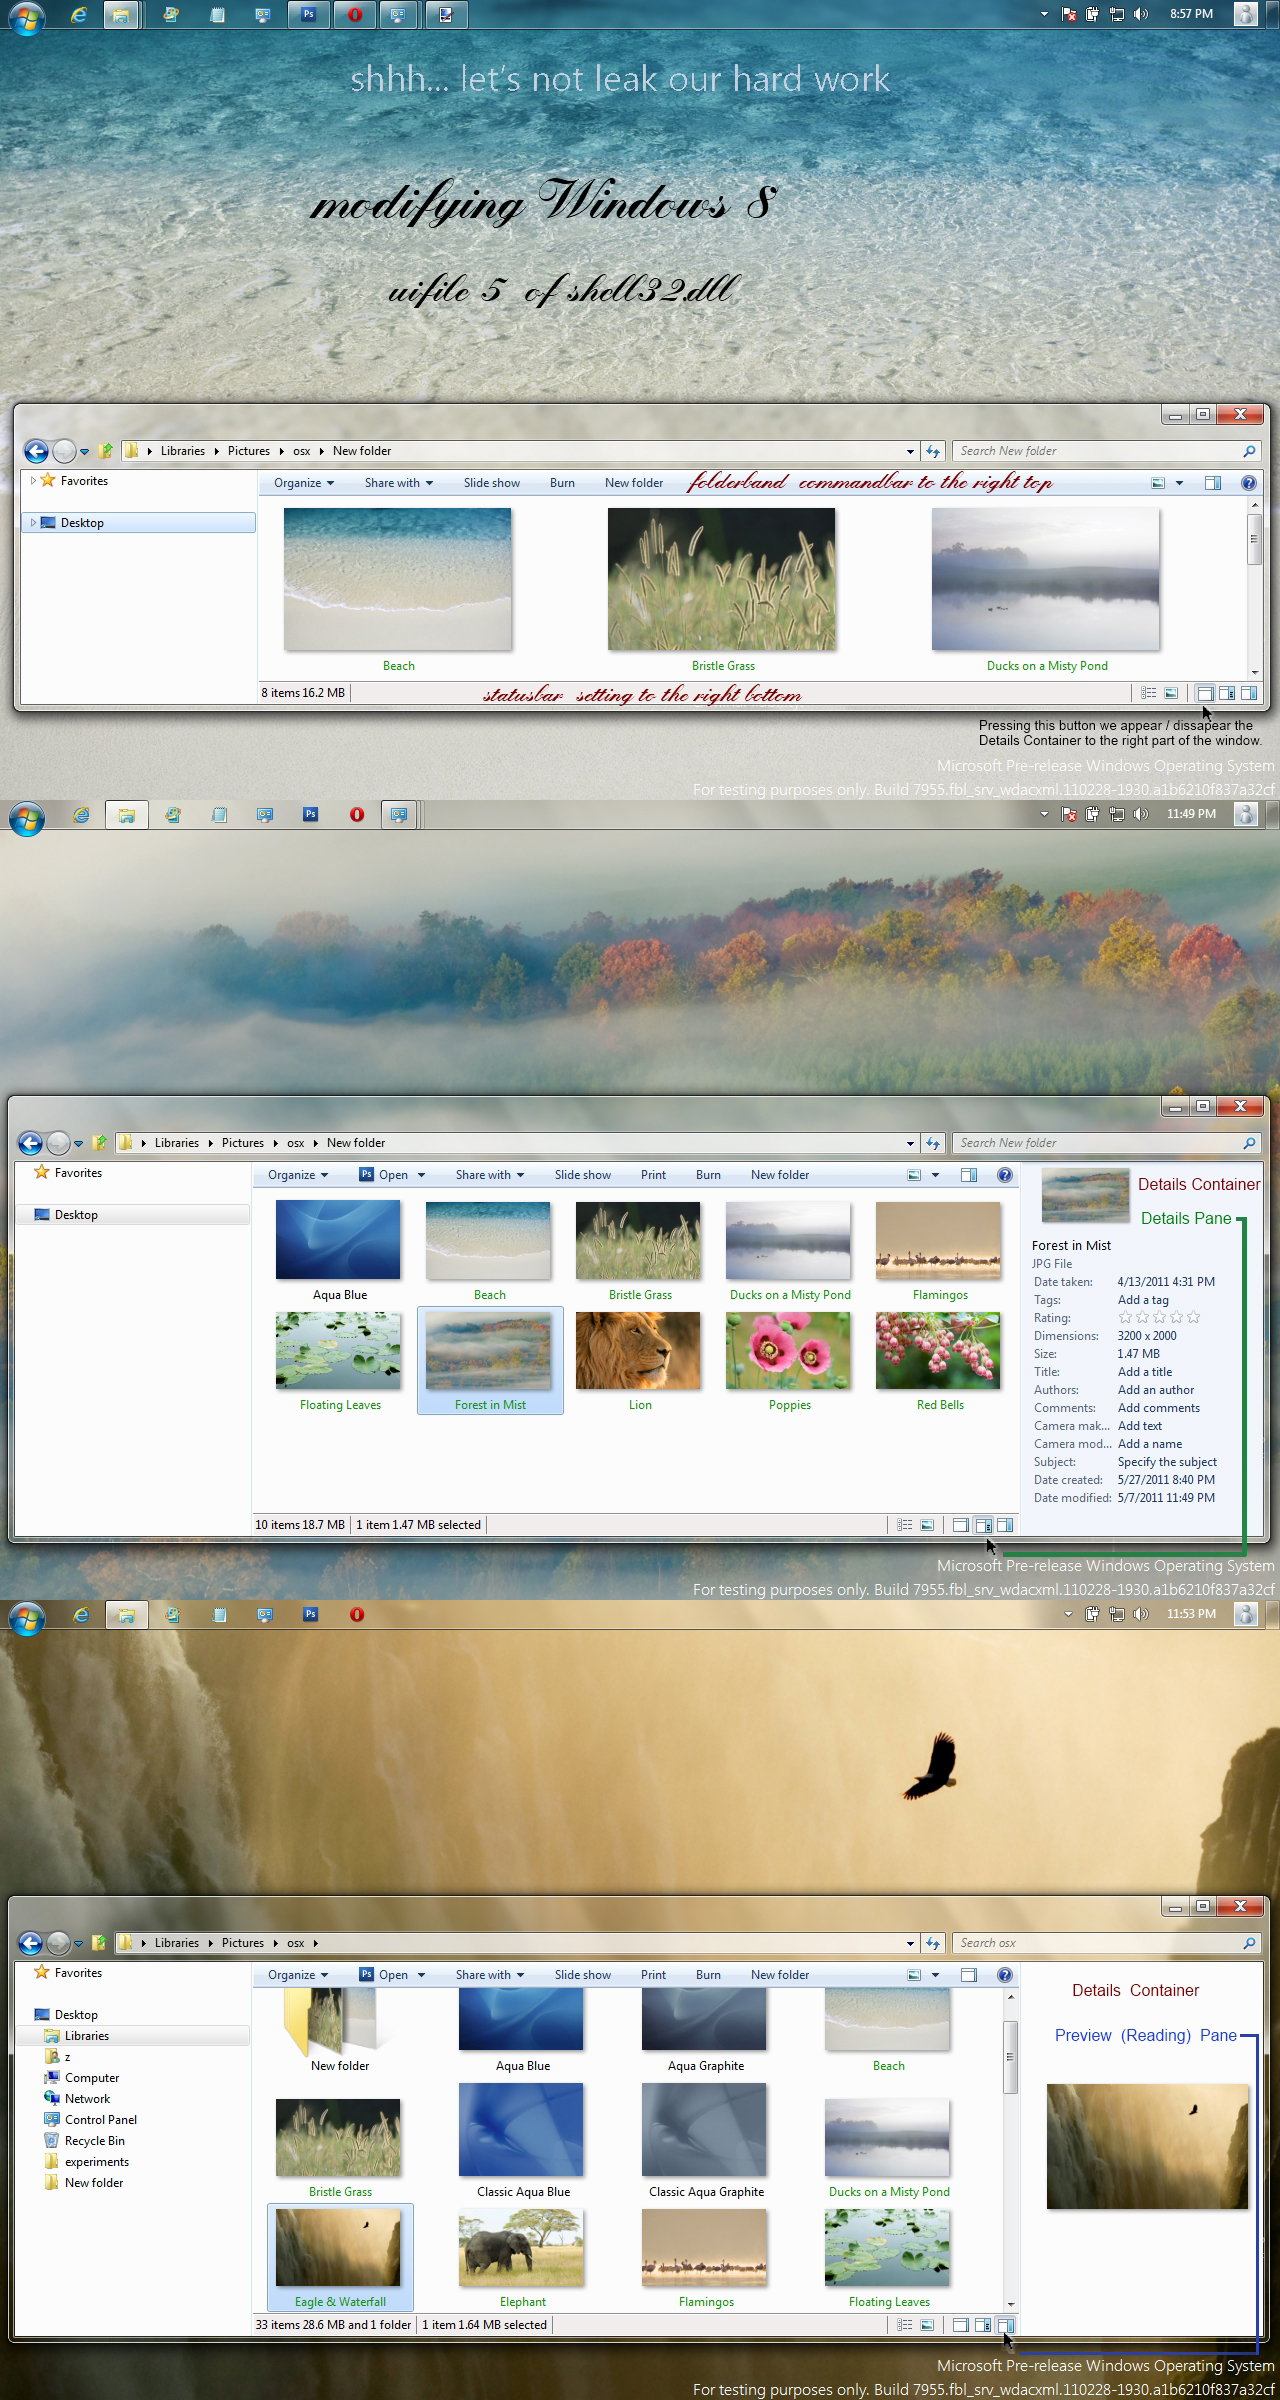 Windows 8 Milestone 2 mod